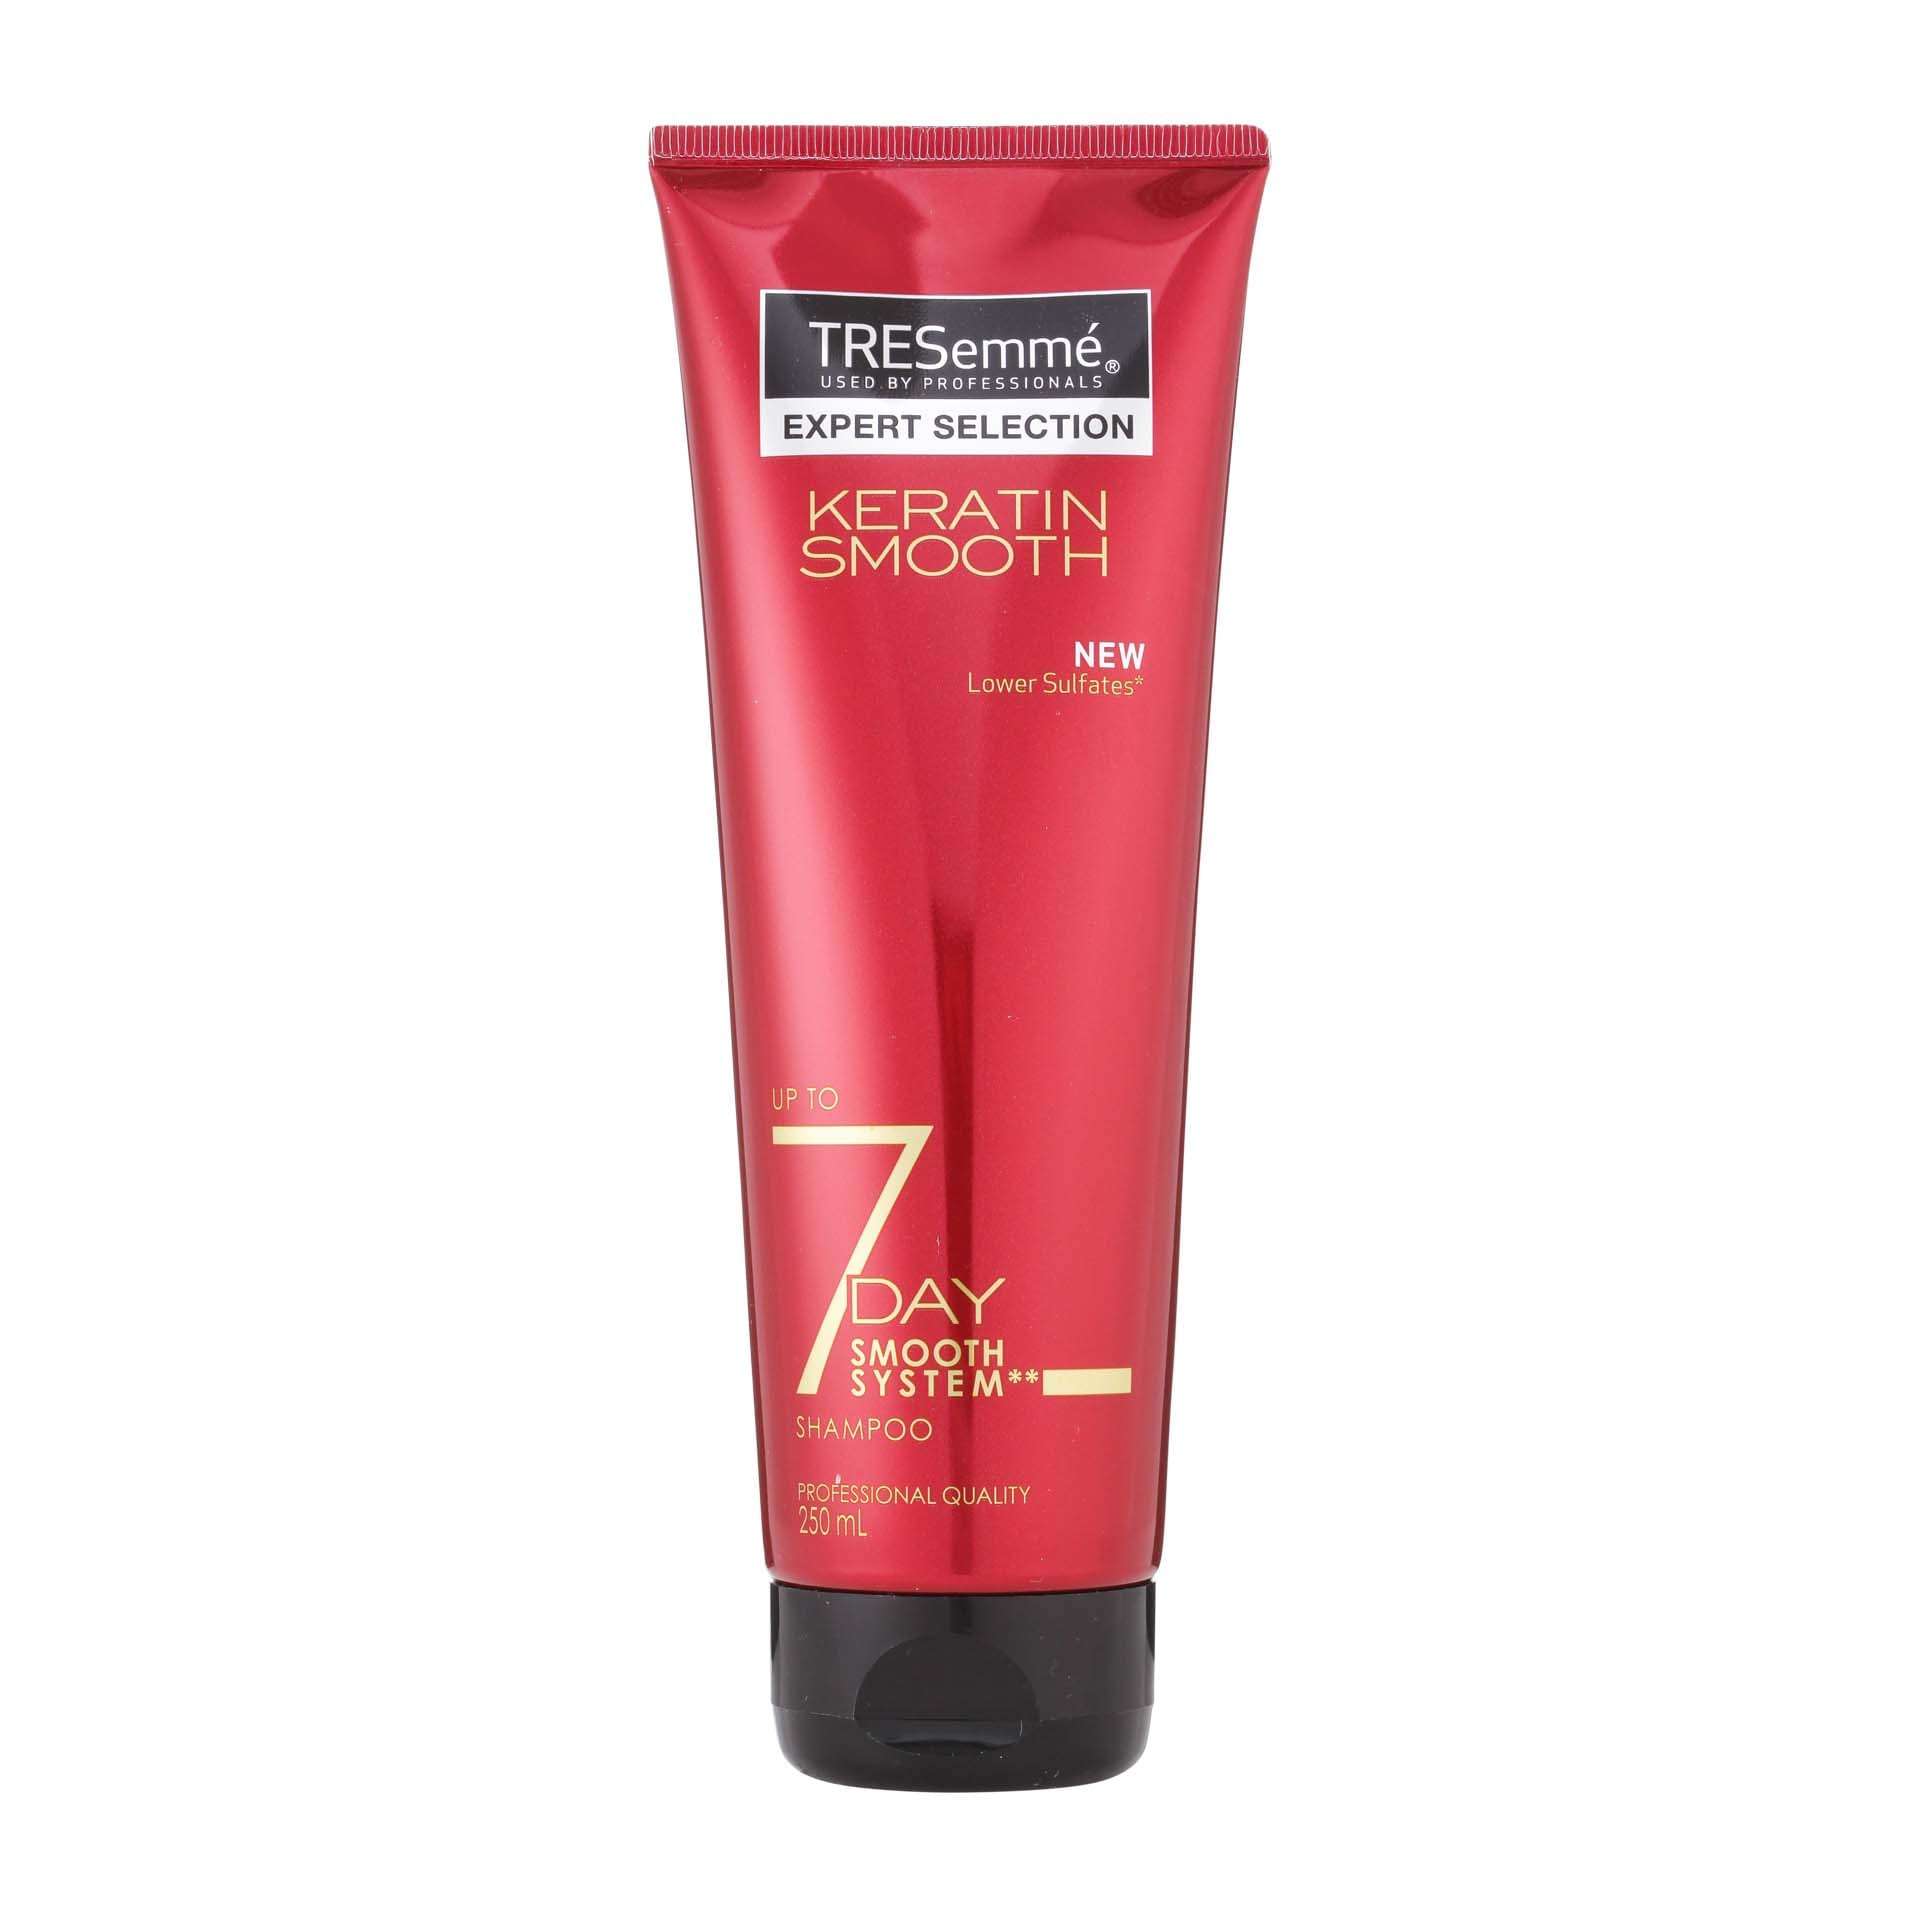 TRESemmé 7 Day Smooth Shampoo